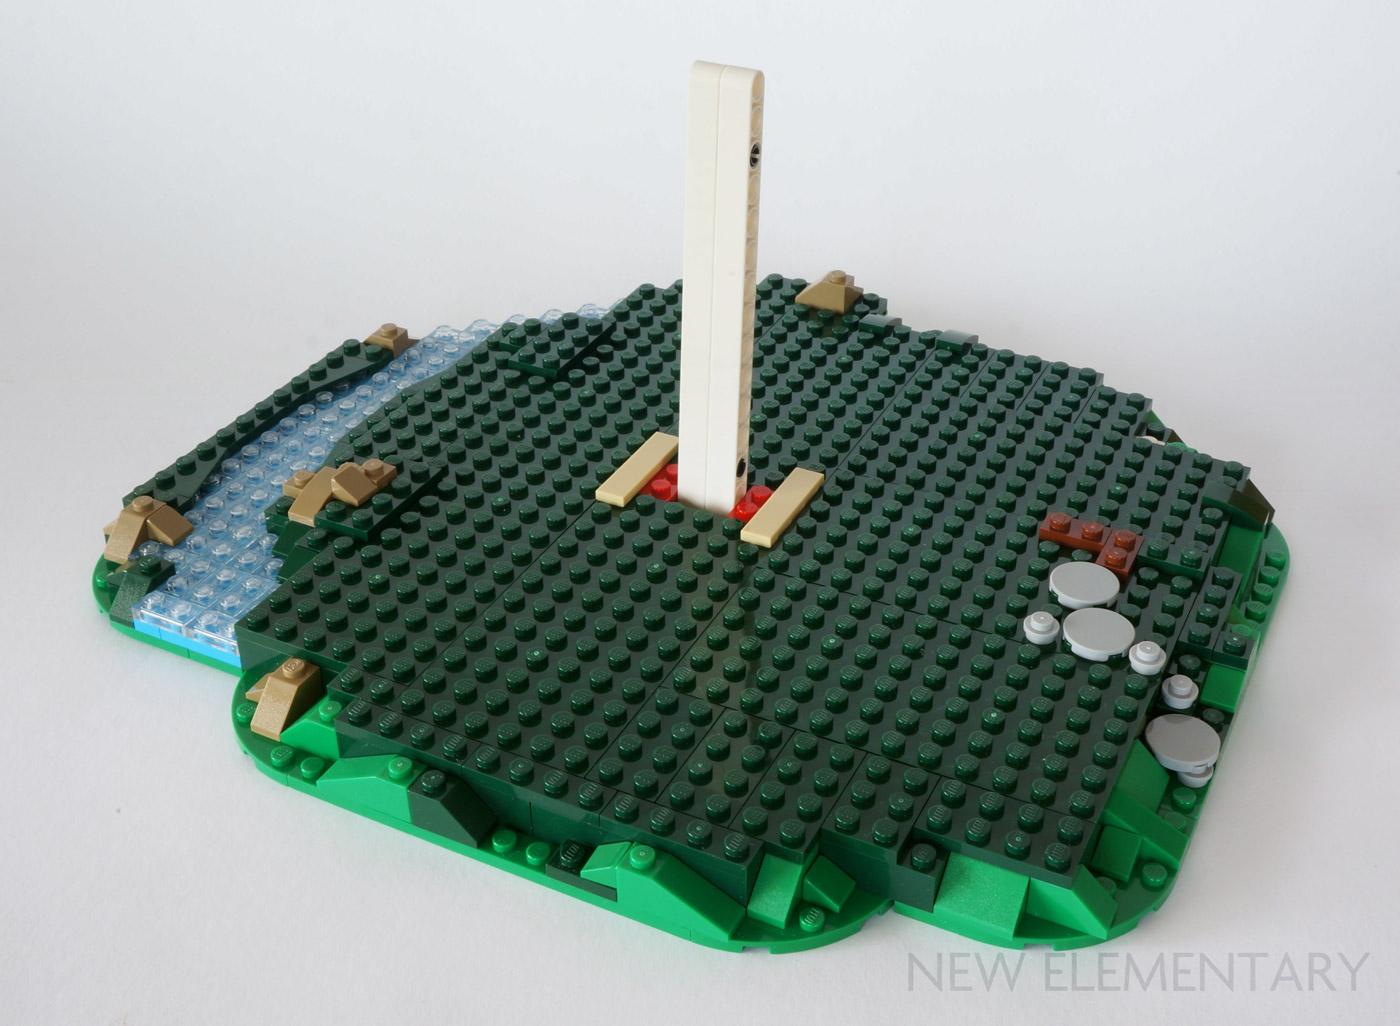 New LEGO Lot of 12 Light Bluish Gray Technic Mindstorms Pins with Stopbush